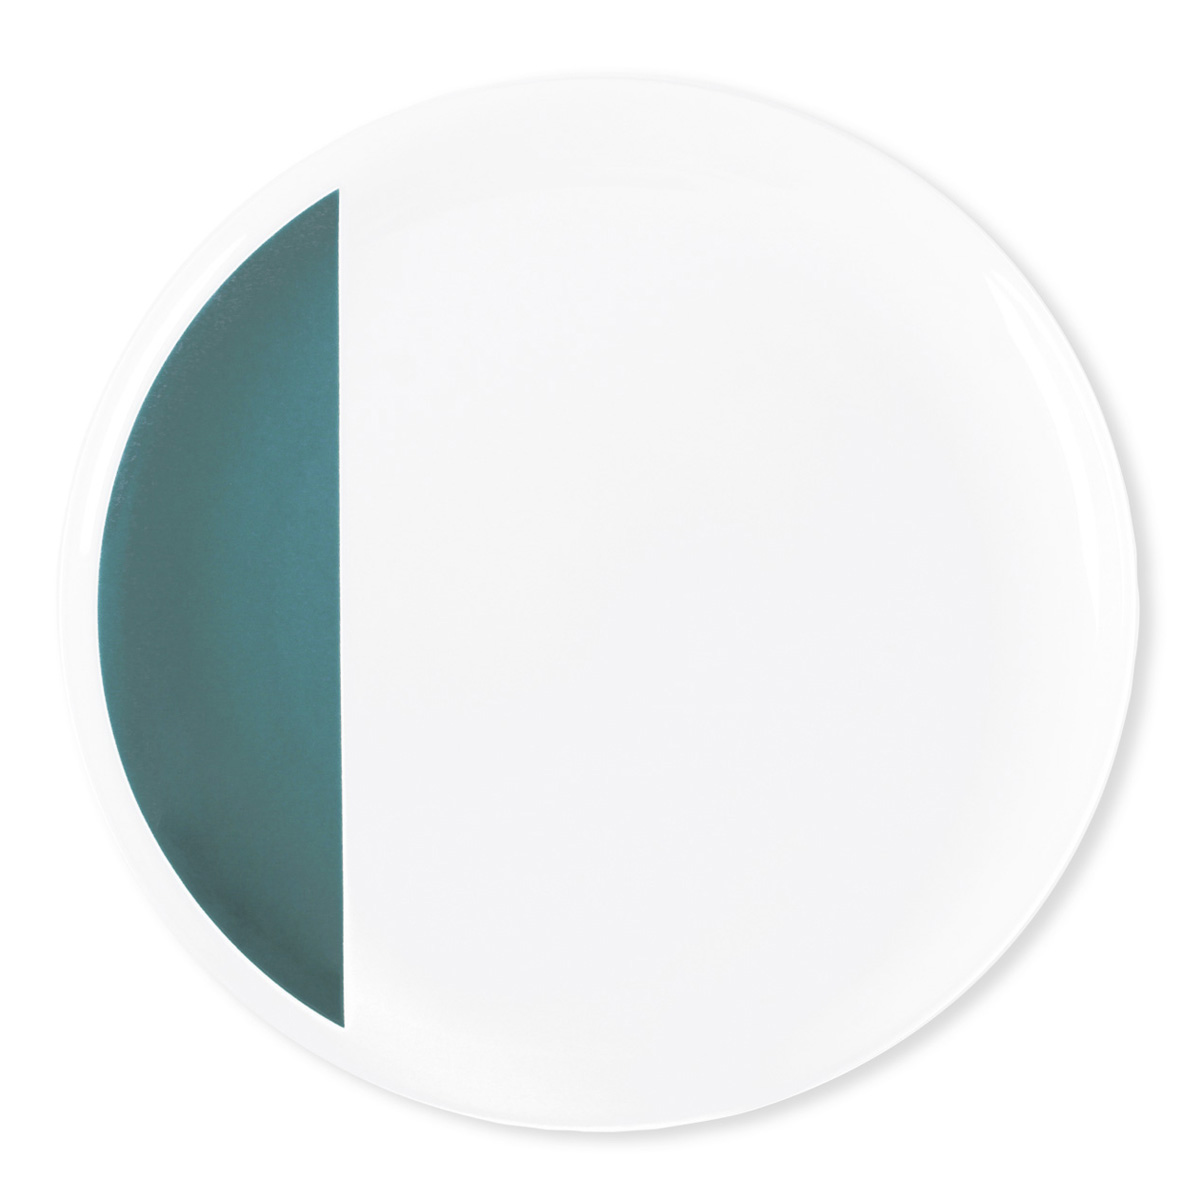 vaisselle bleu canard design assiette retro bruno evrard. Black Bedroom Furniture Sets. Home Design Ideas